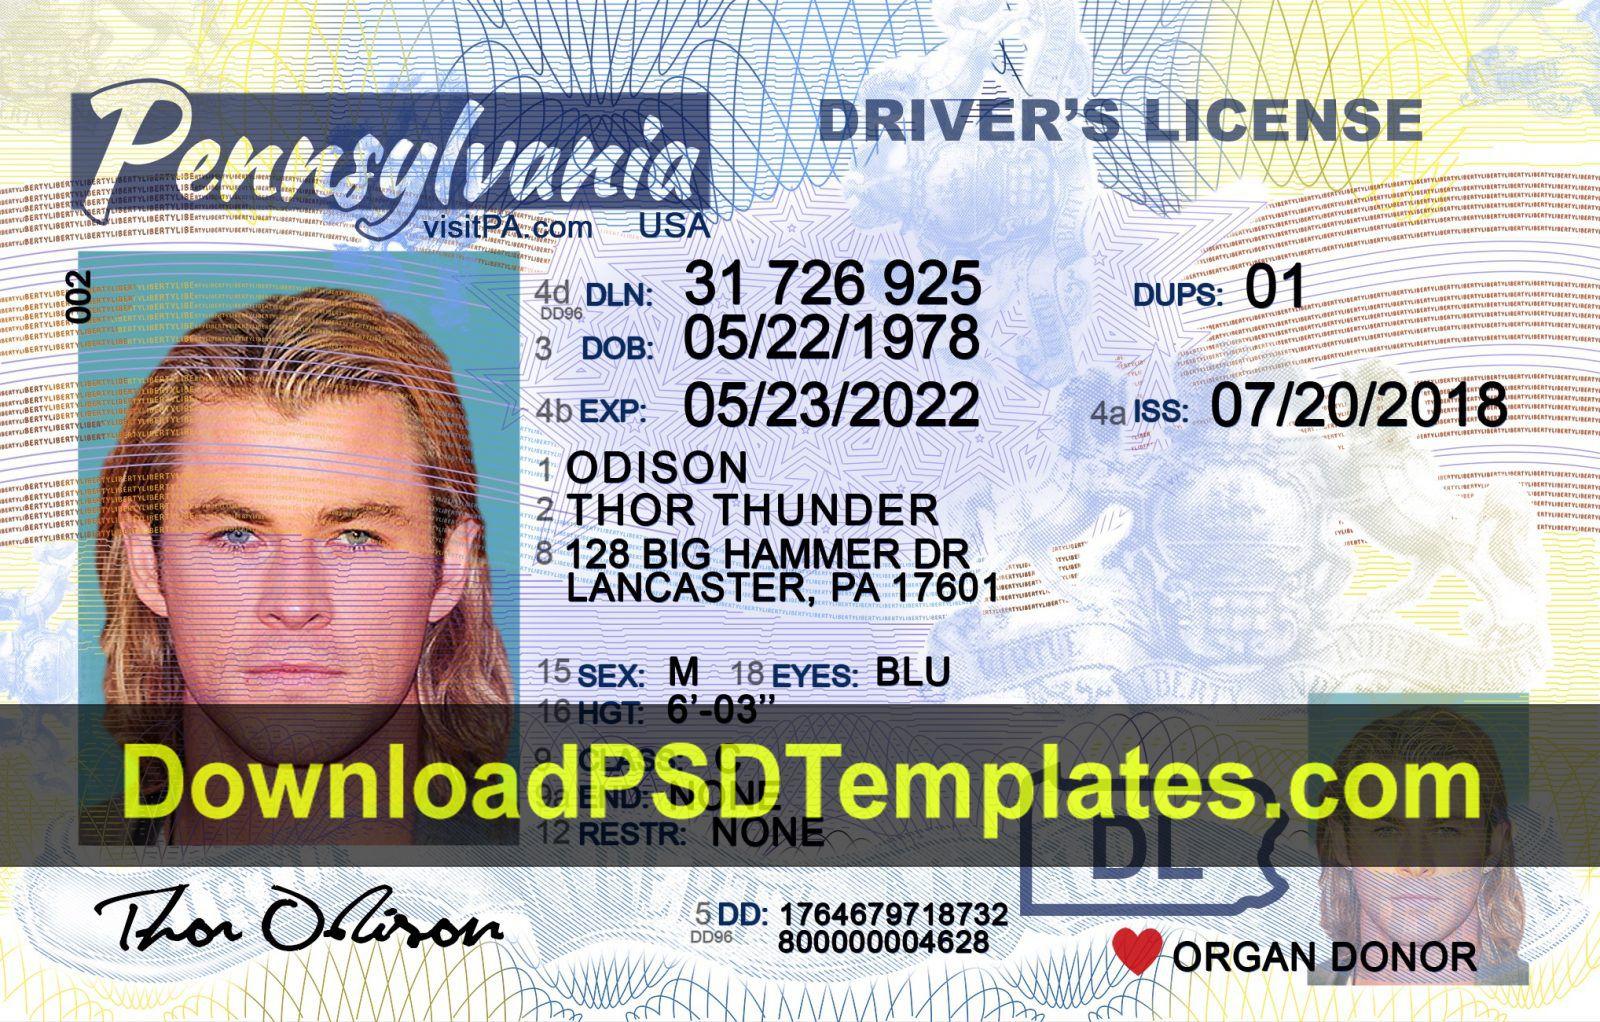 Fake driving license templates psd files regarding